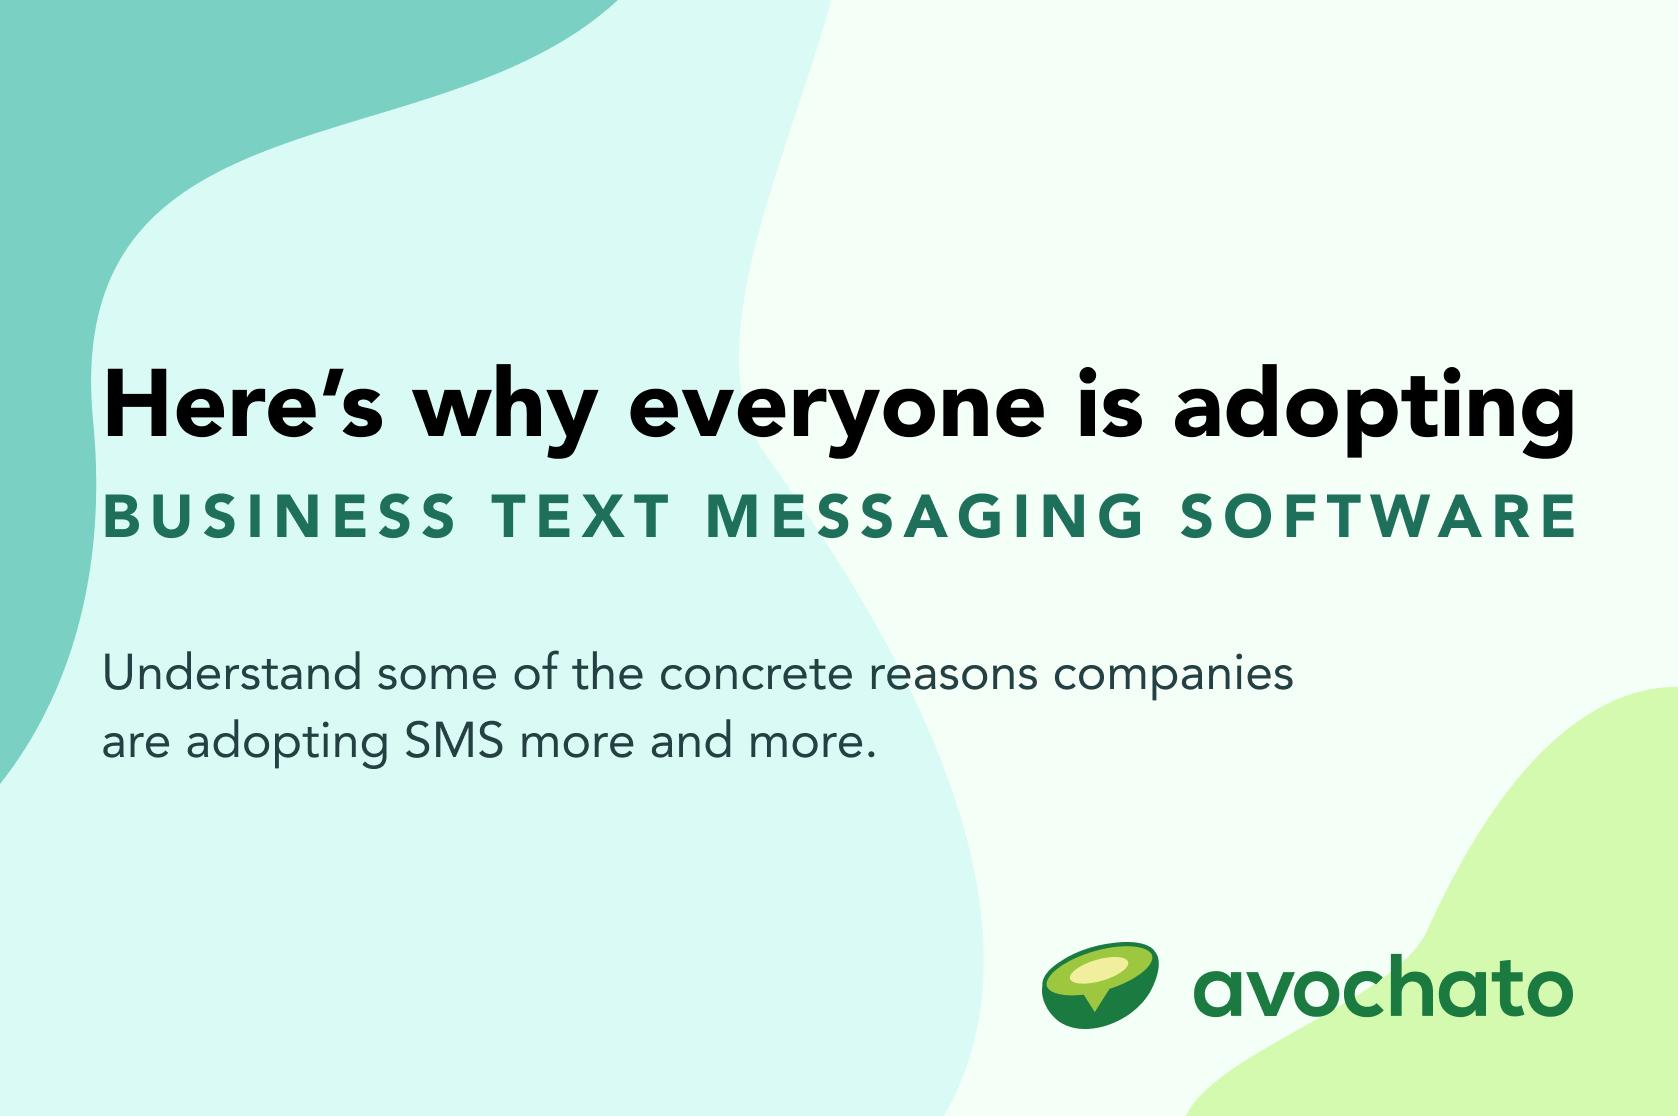 adopting business text messaging